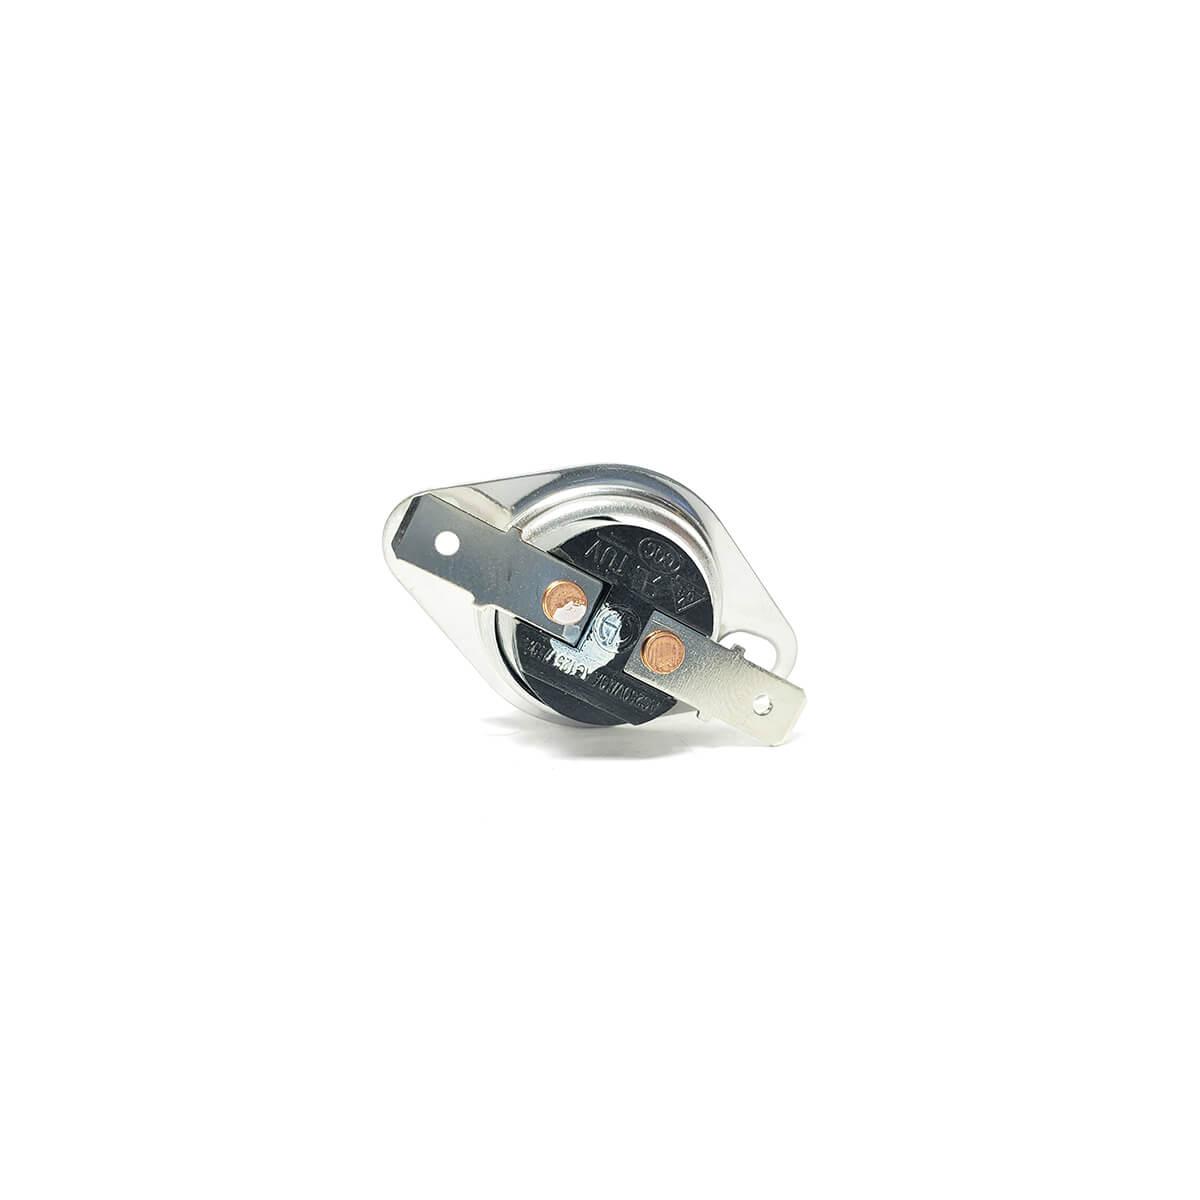 Termostato De Segurança 105º Para Microondas Brastemp/Consul - W10563586